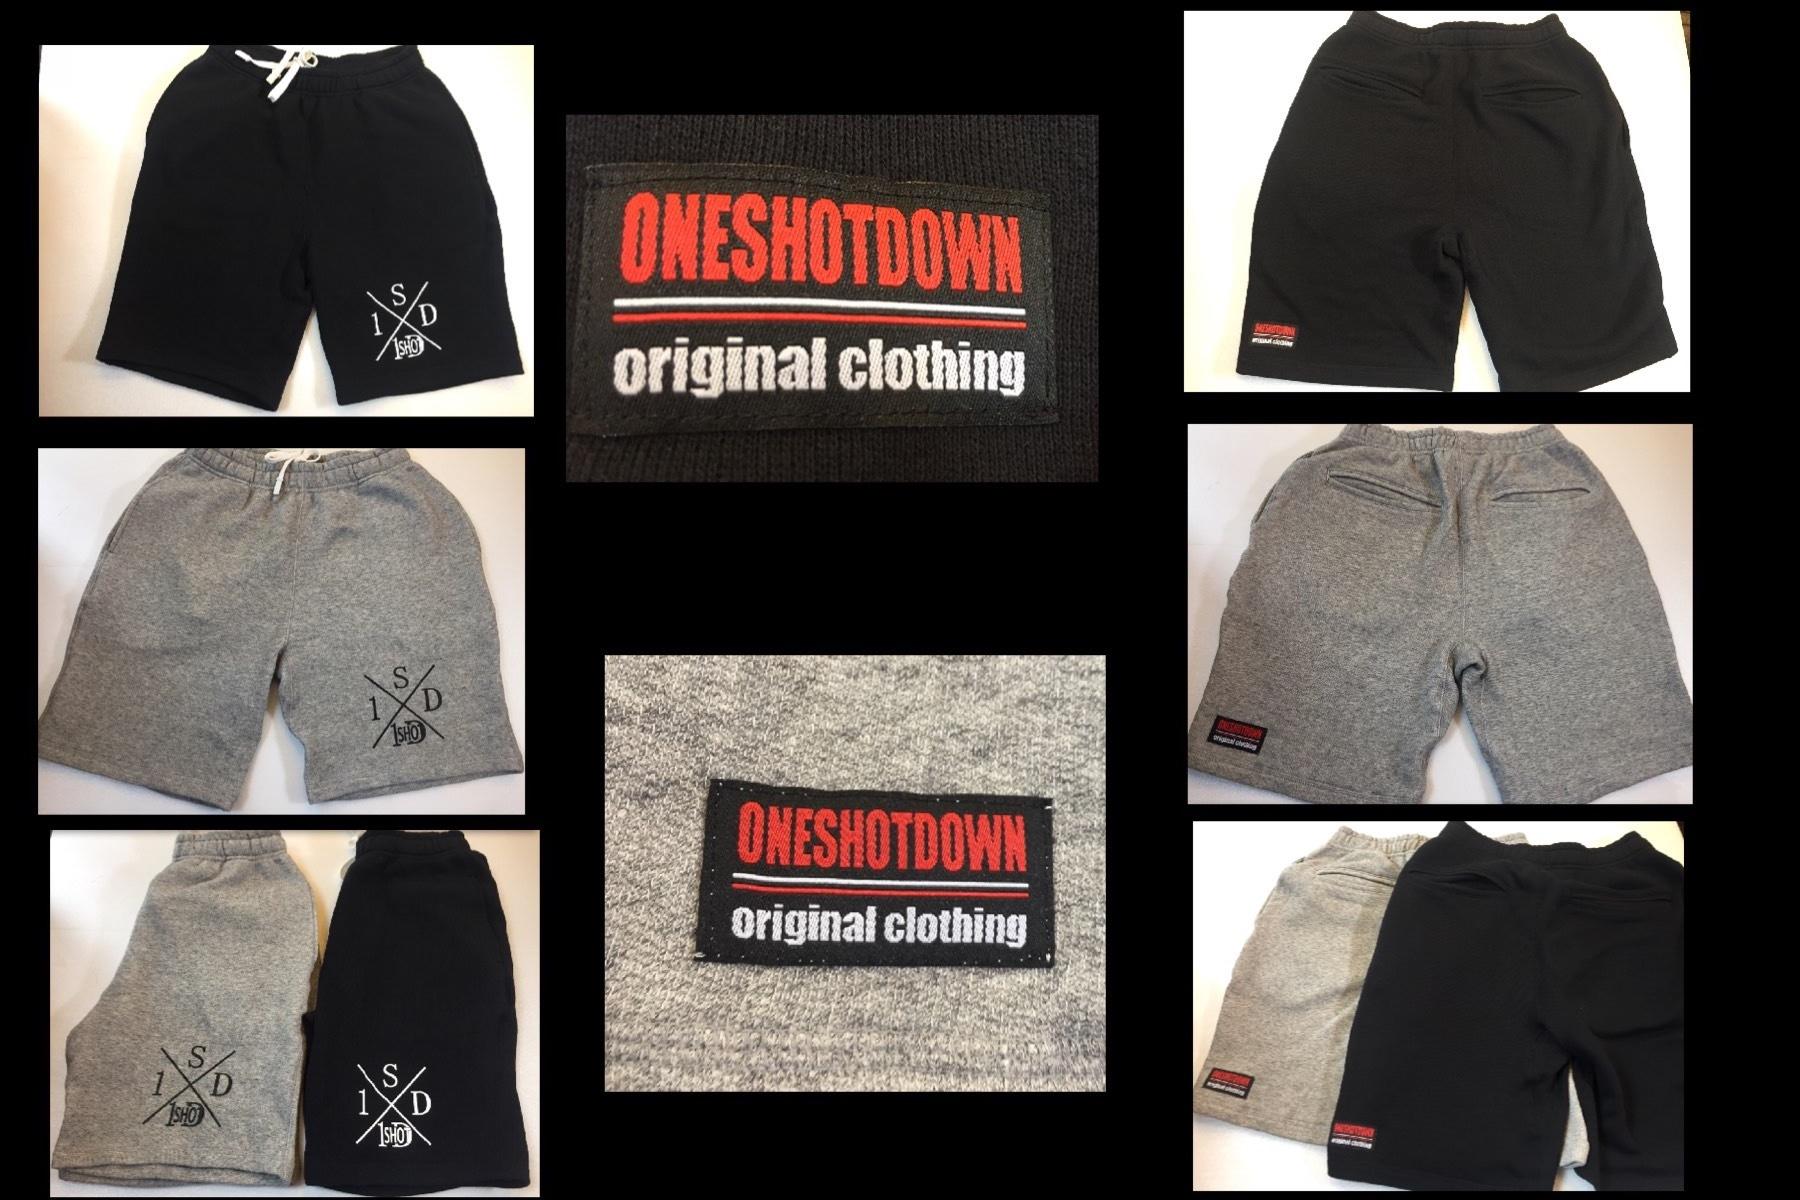 ONESHOTDOWN Xデザイン フレンチテリー ハーフパンツ - 画像4